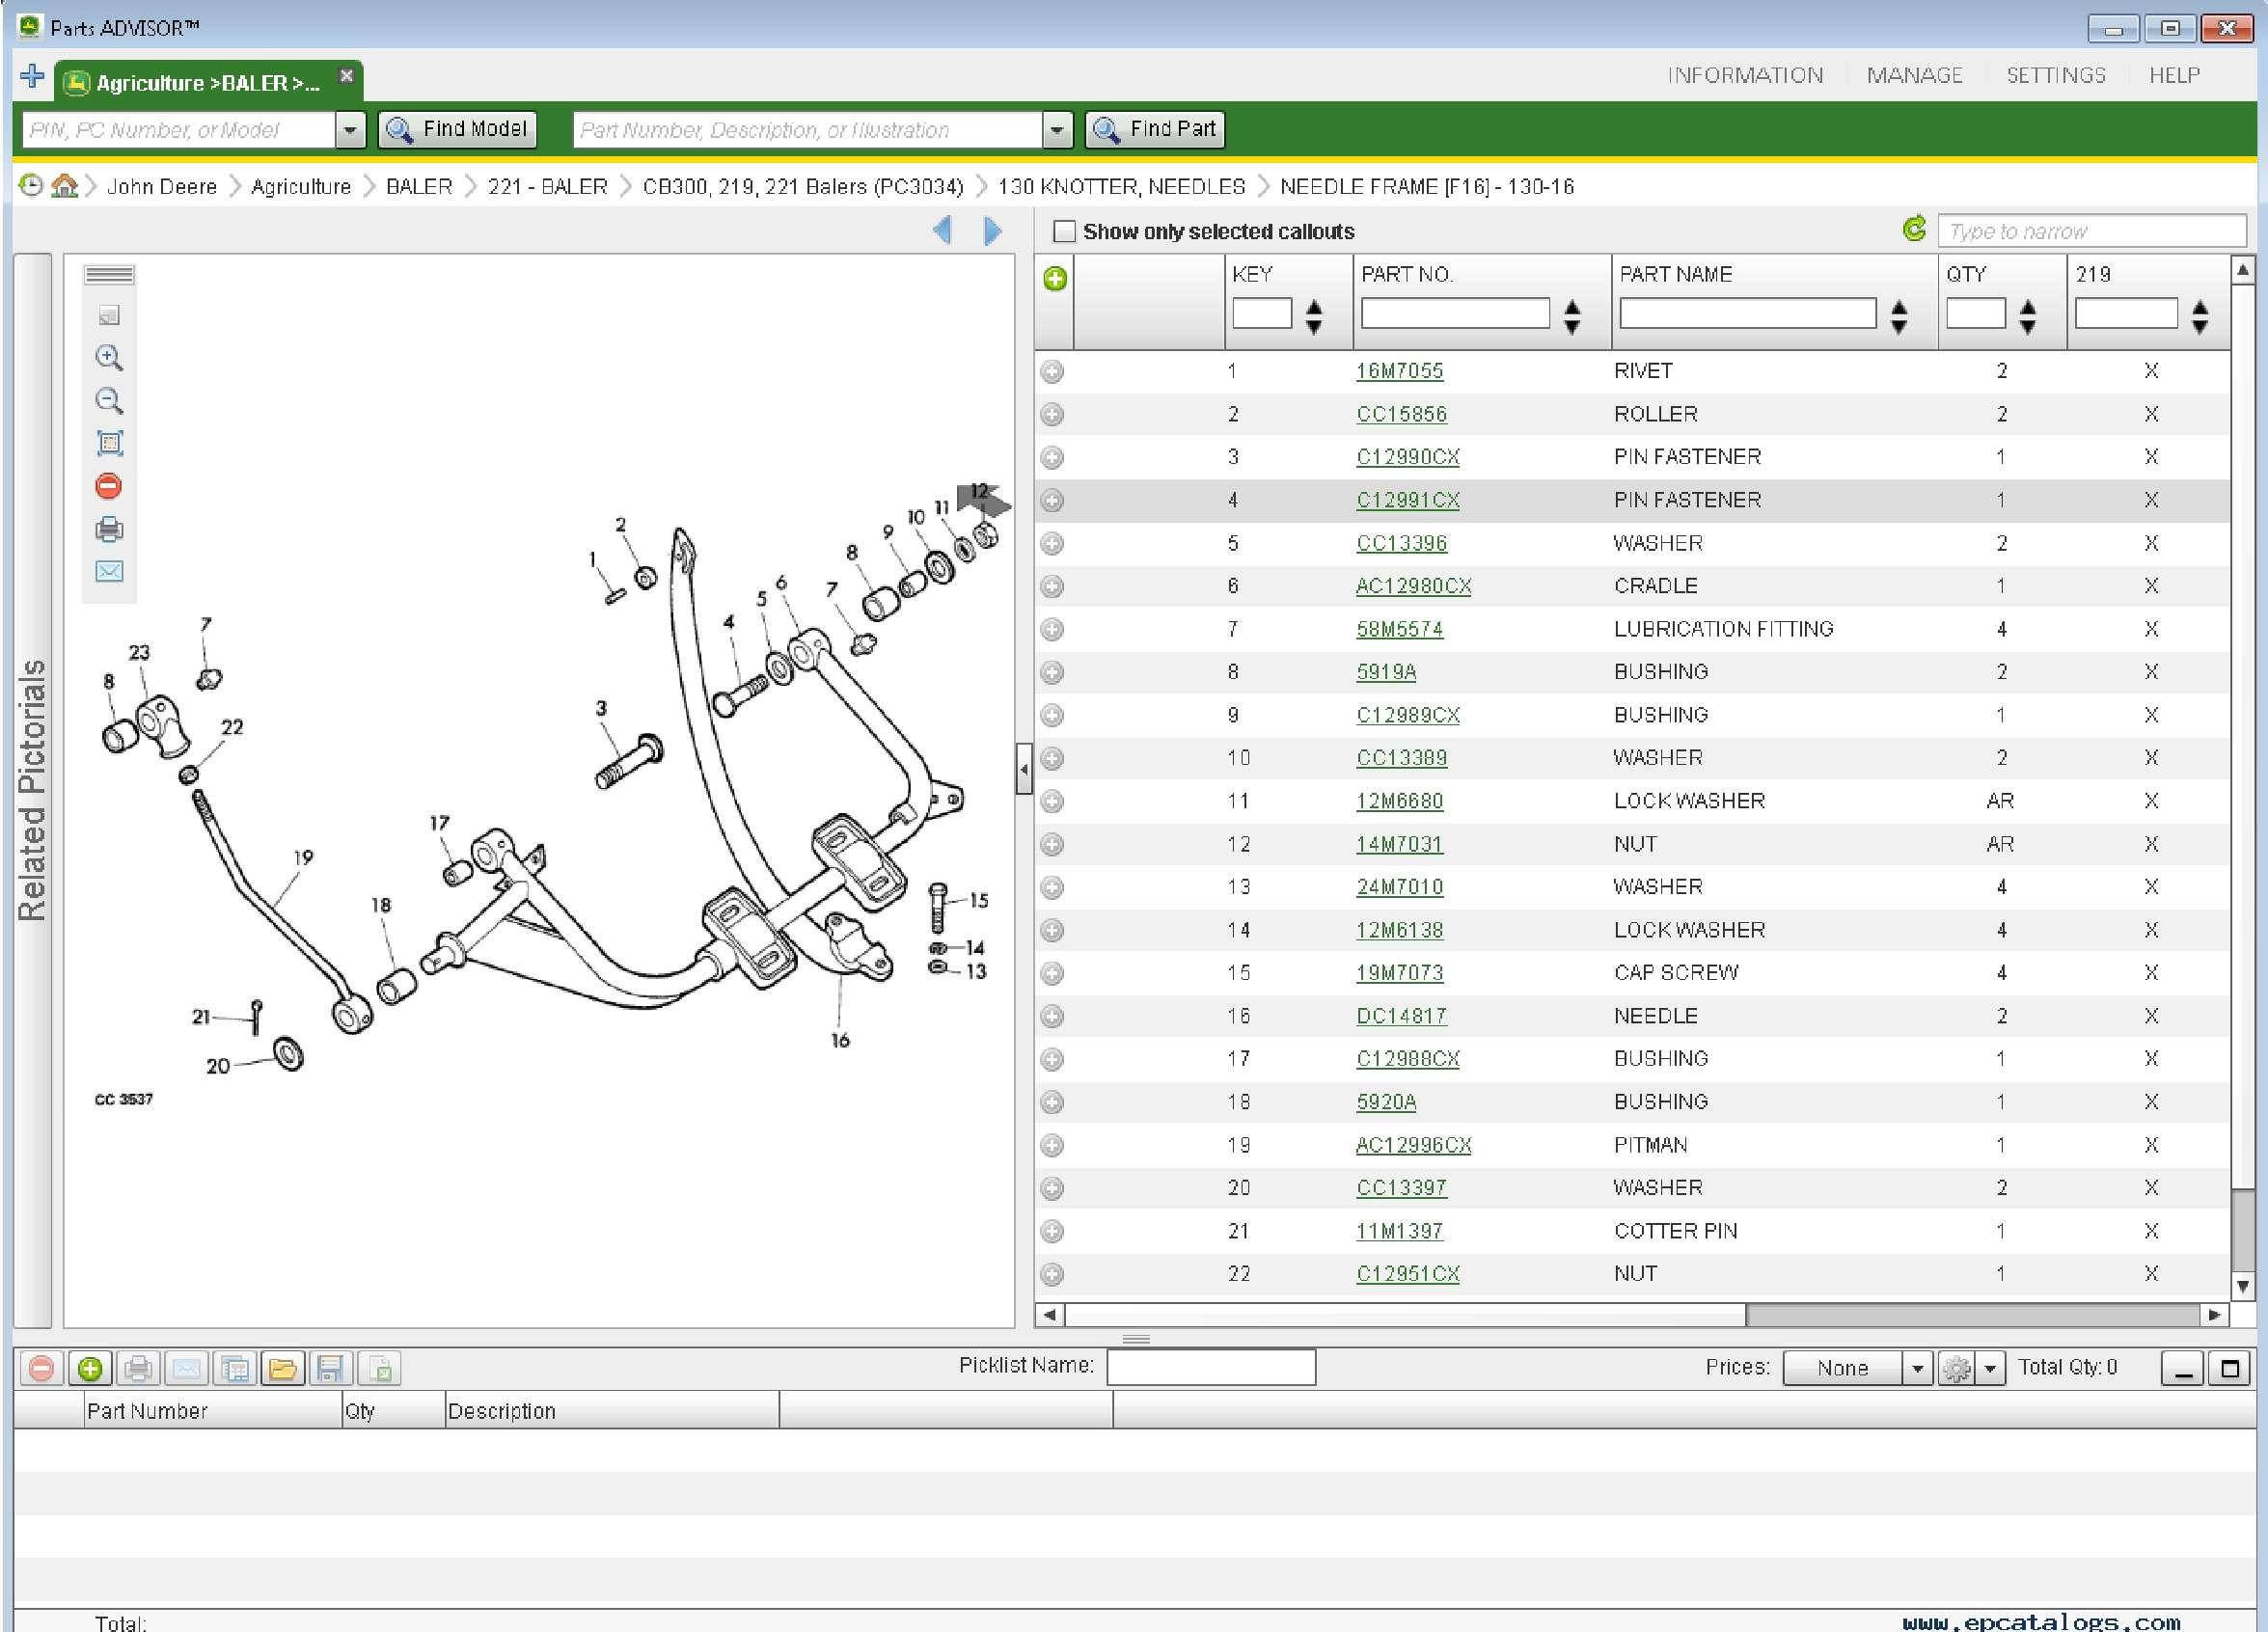 John Deere Parts Advisor 2020 SS-01